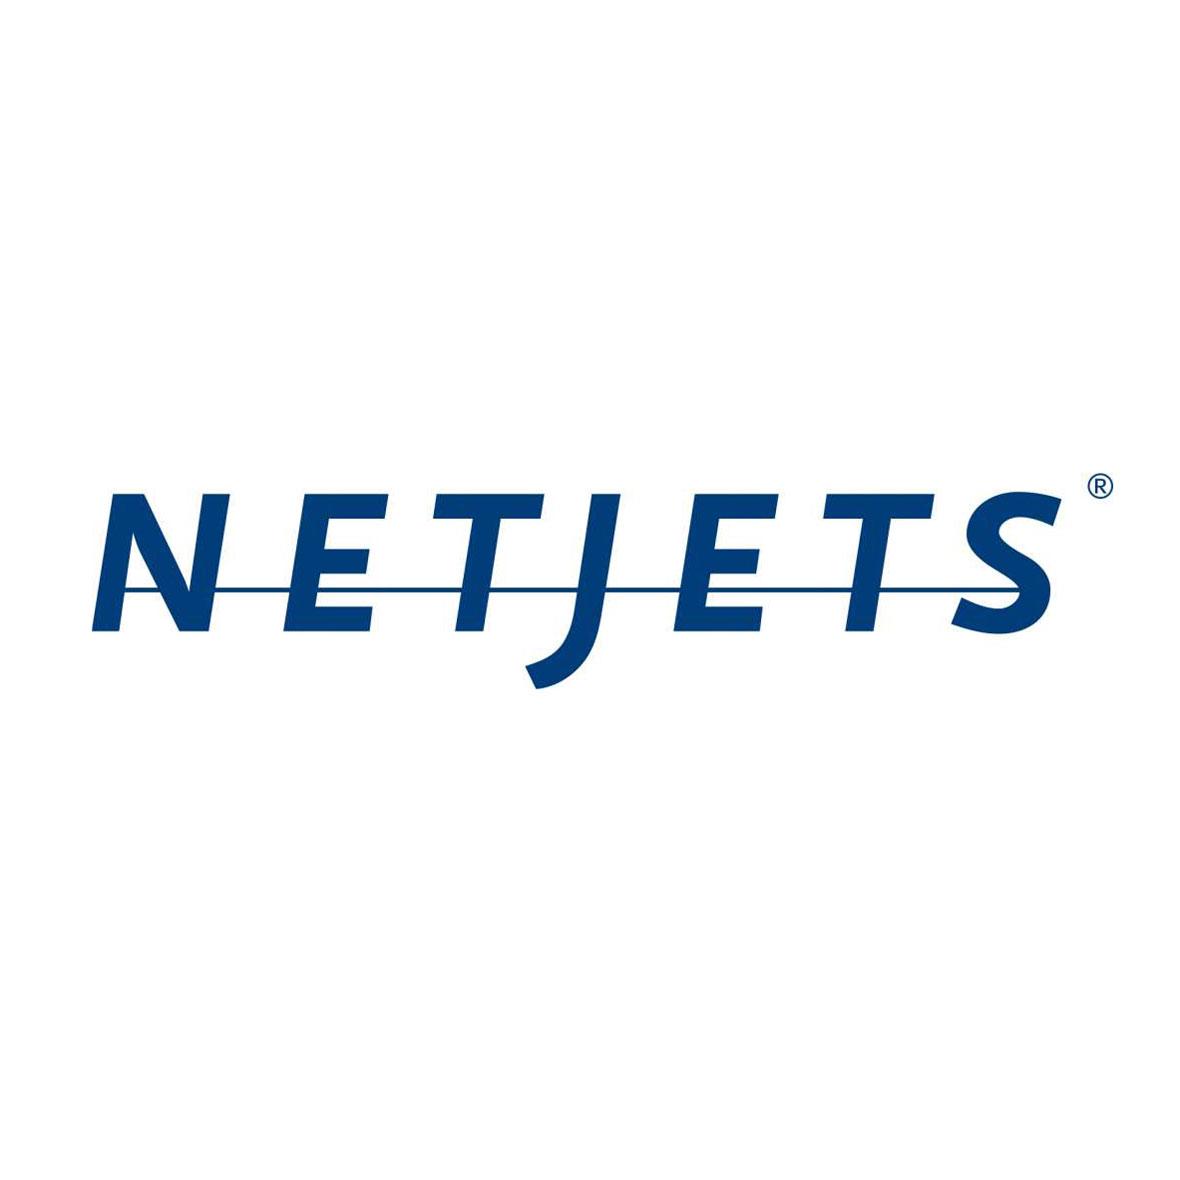 Netjets logo clipart clip art freeuse Netjets Logos clip art freeuse